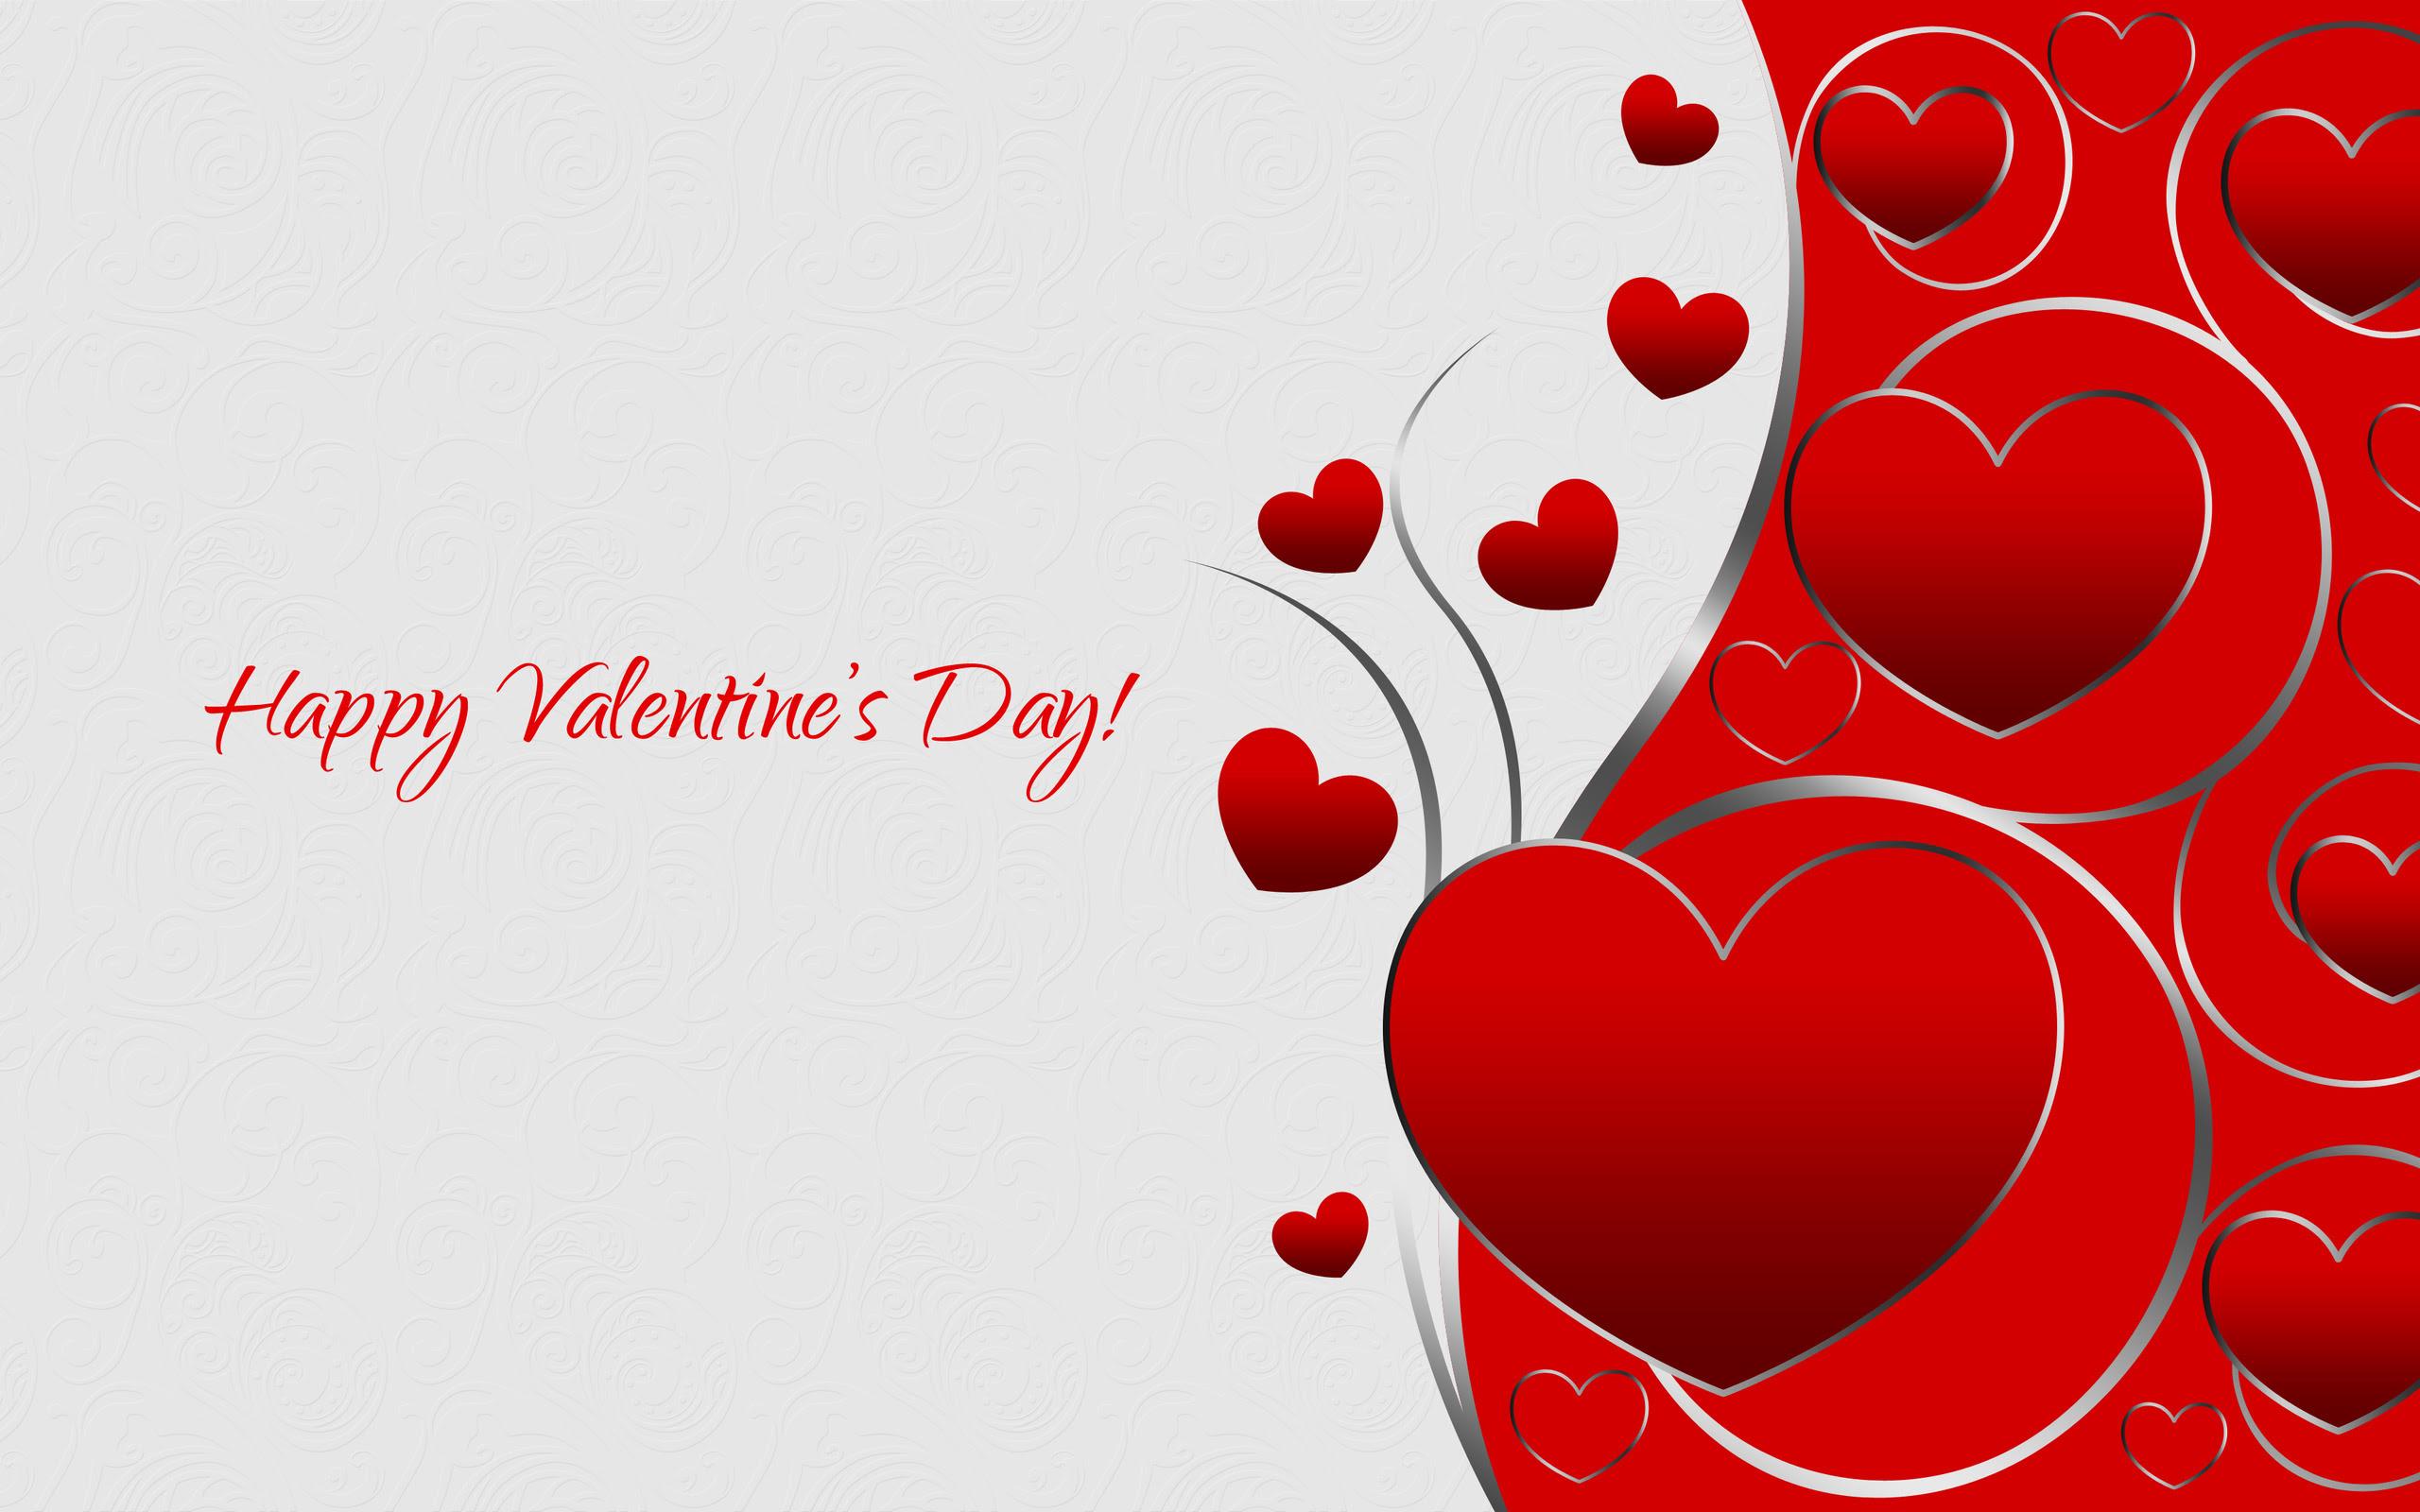 Happy Valentineu002639;s Day Wallpaper 1 High Resolution Wallpaper  Hdlovewall.com